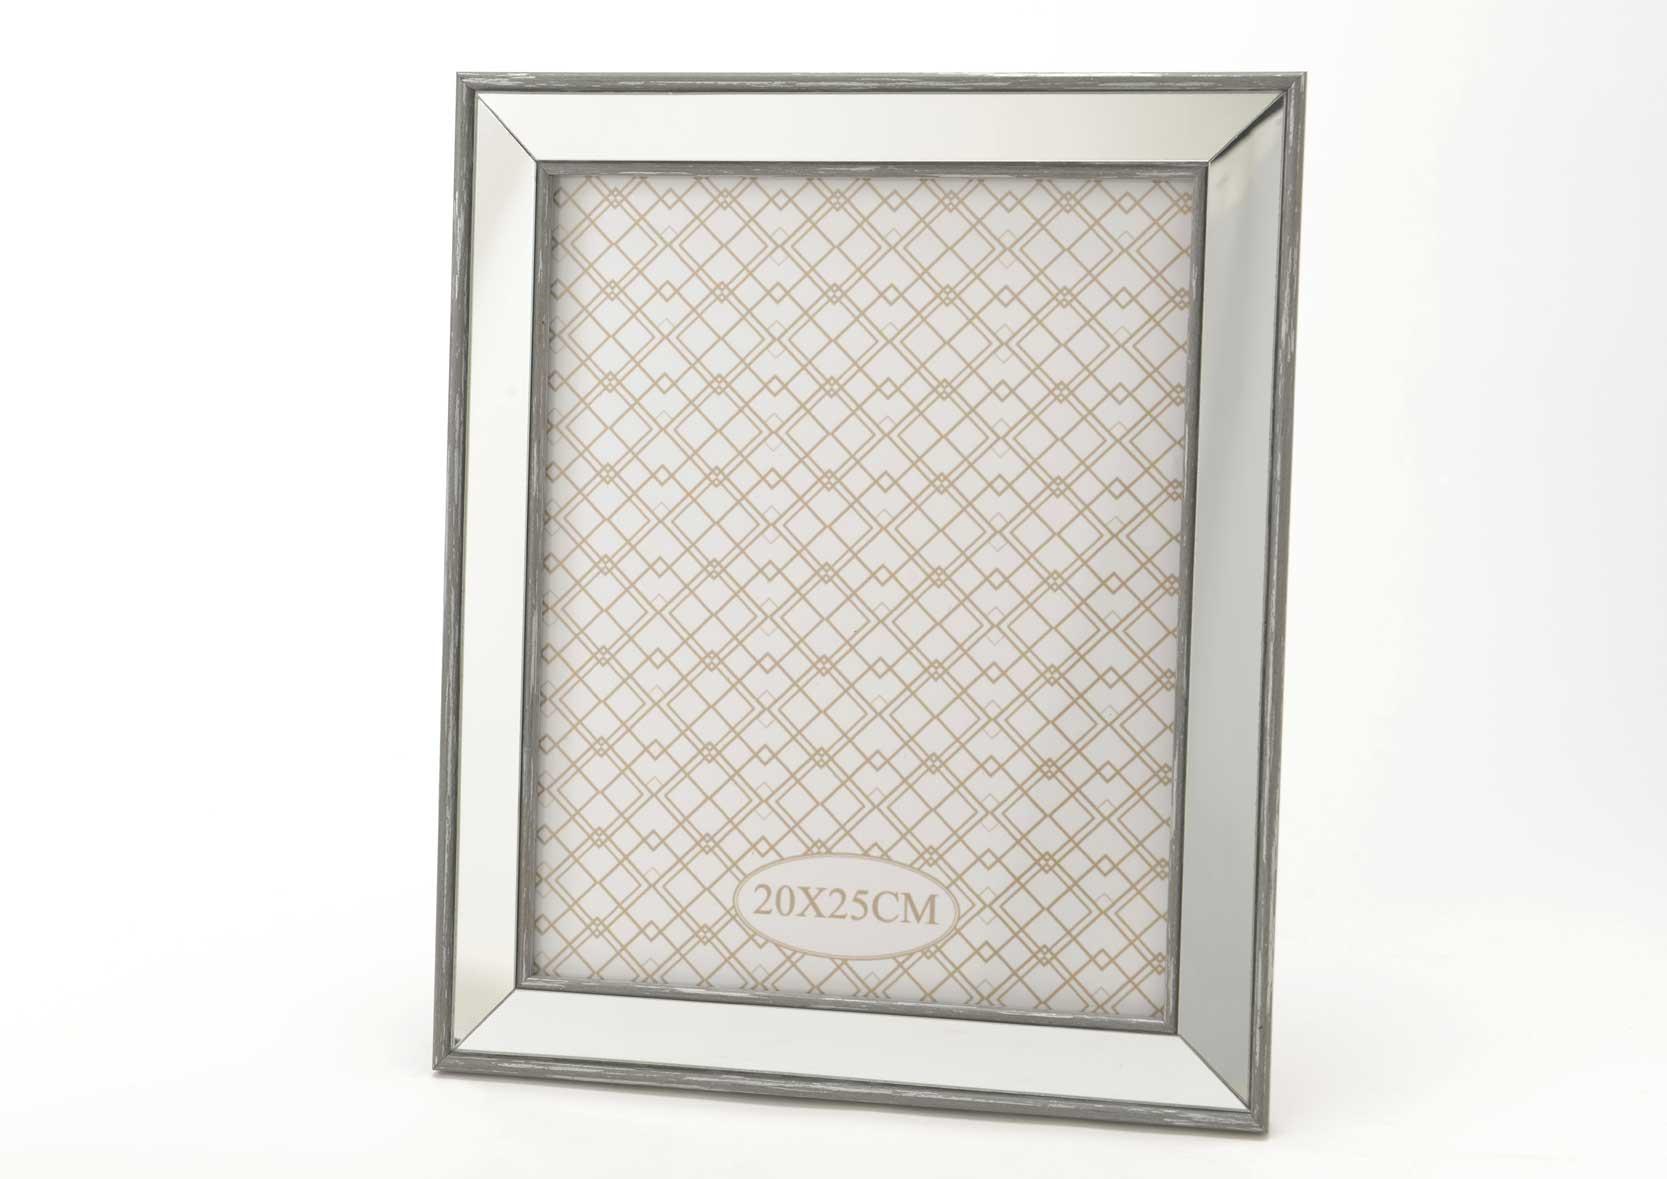 Cadre photo miroir gris for Miroir cadre